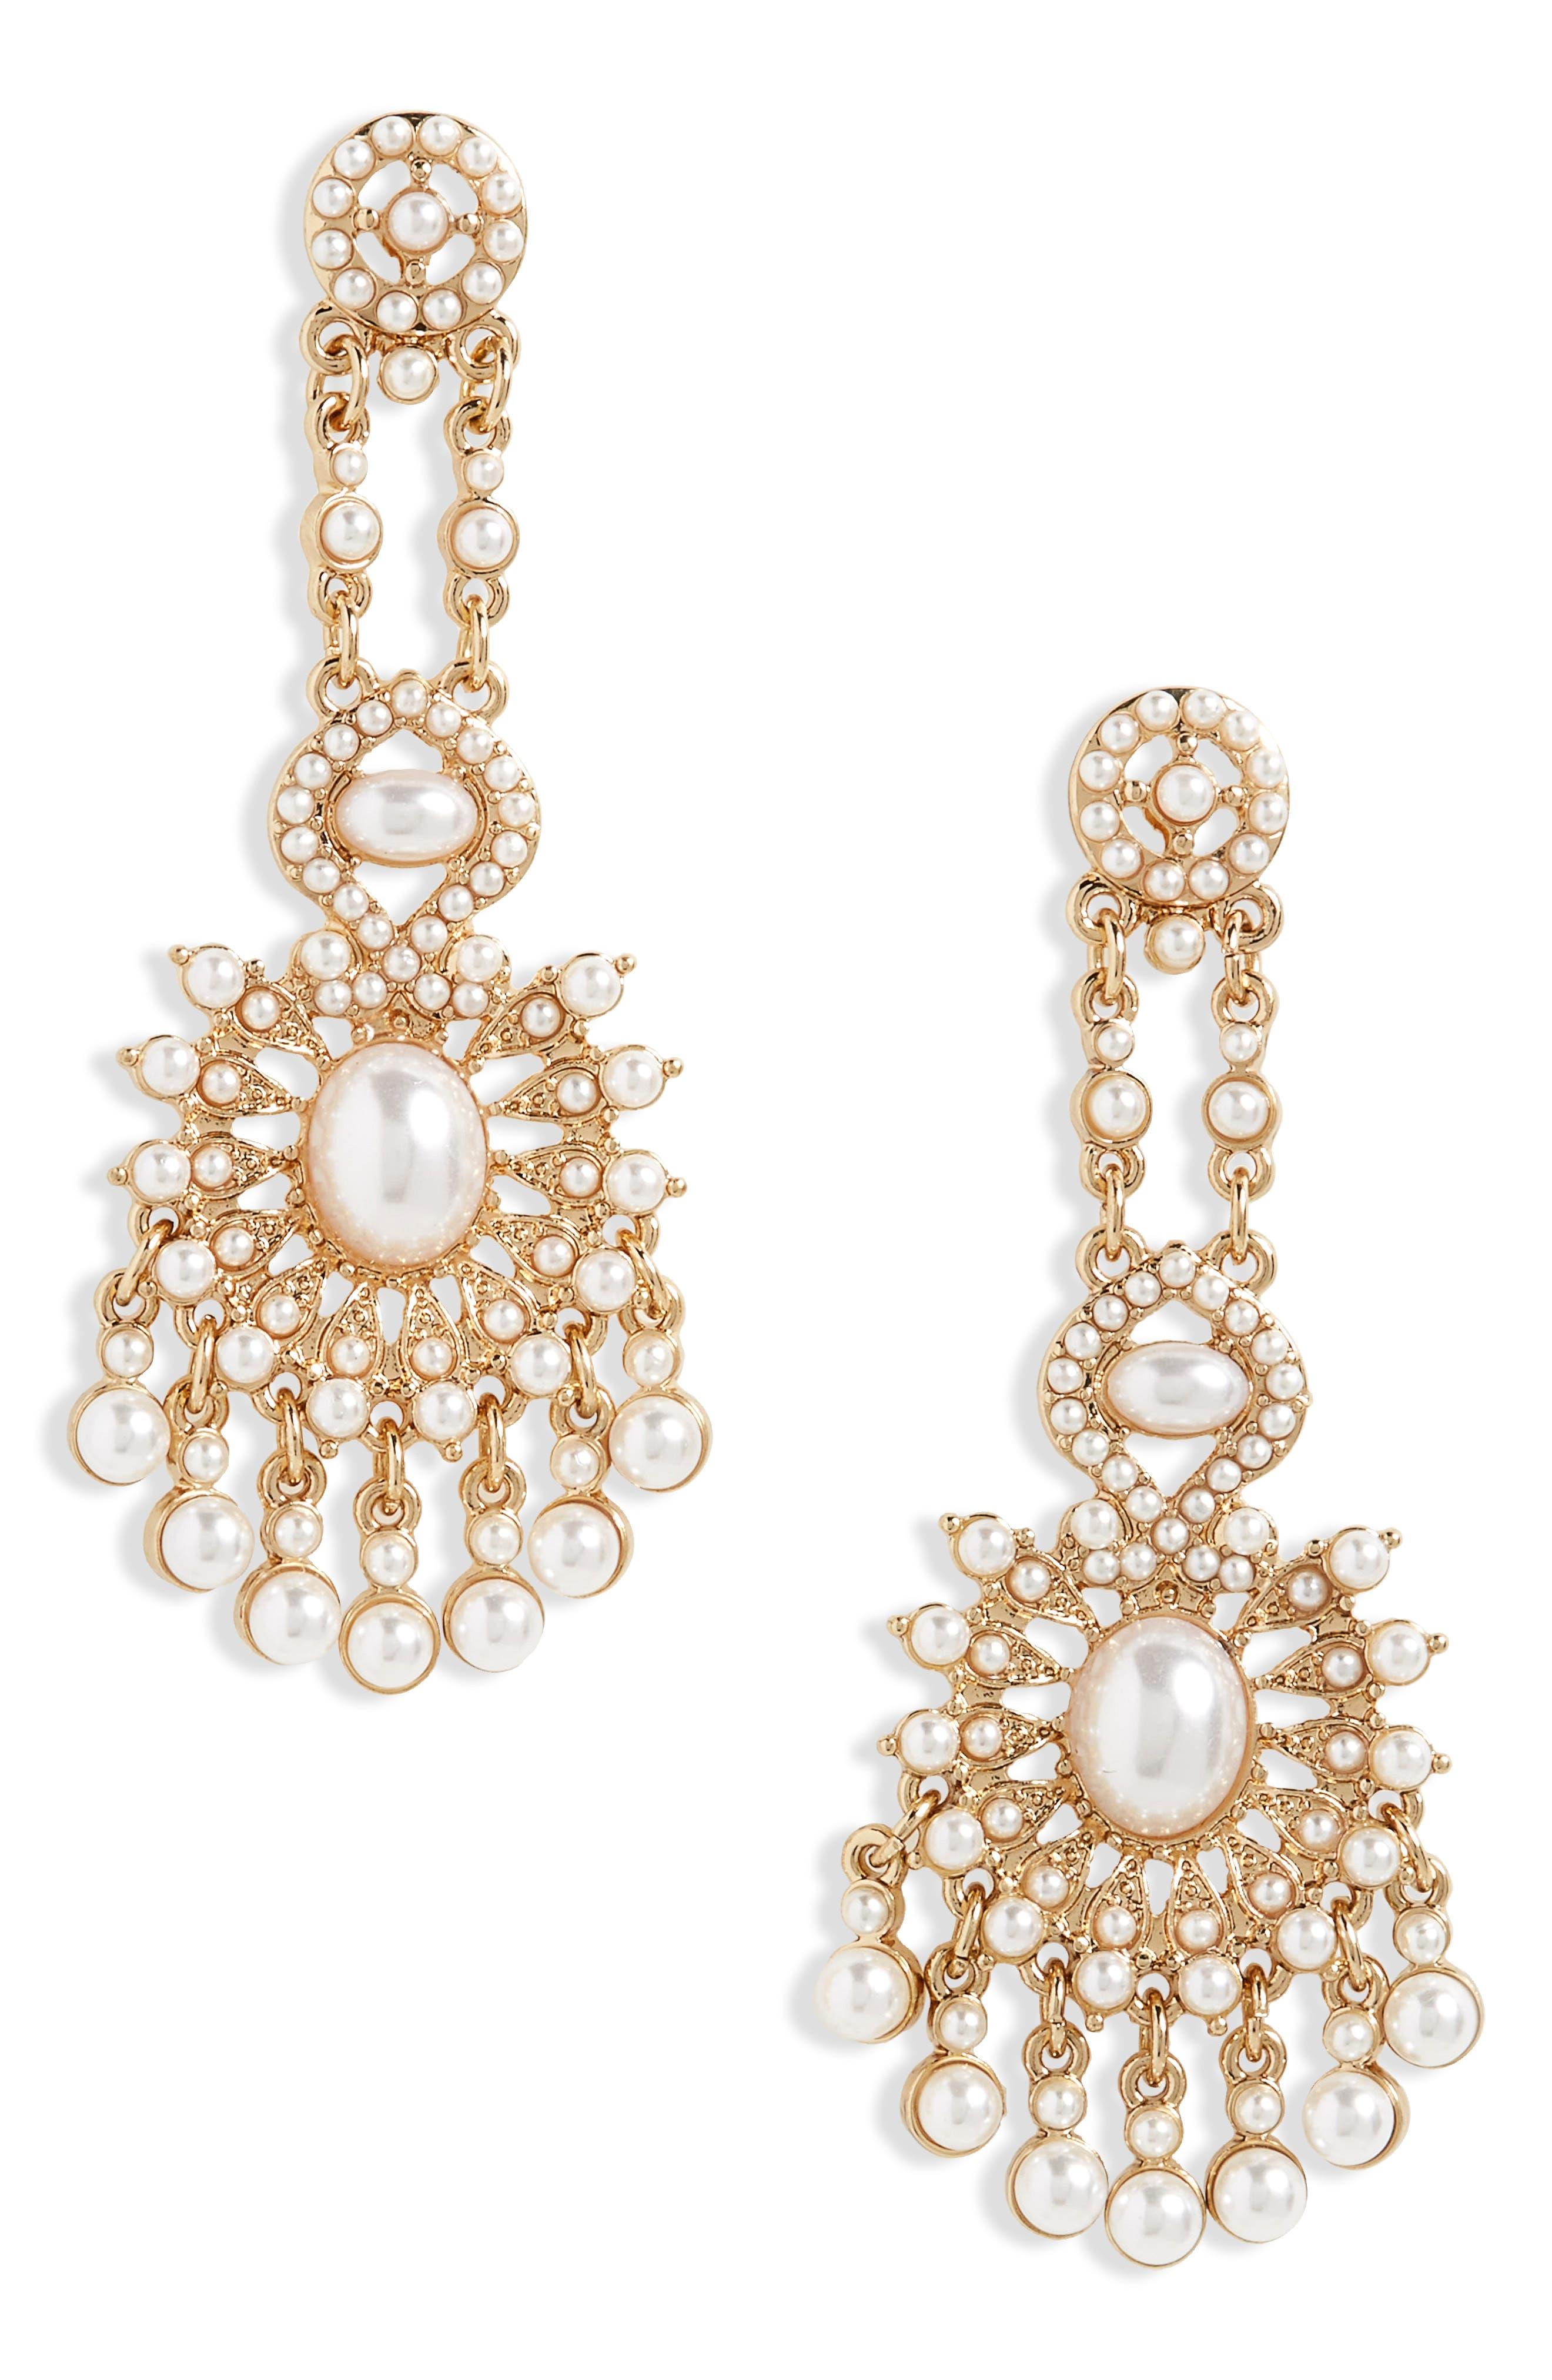 Main Image - Loren Olivia Imitation Pearl Chandelier Earrings